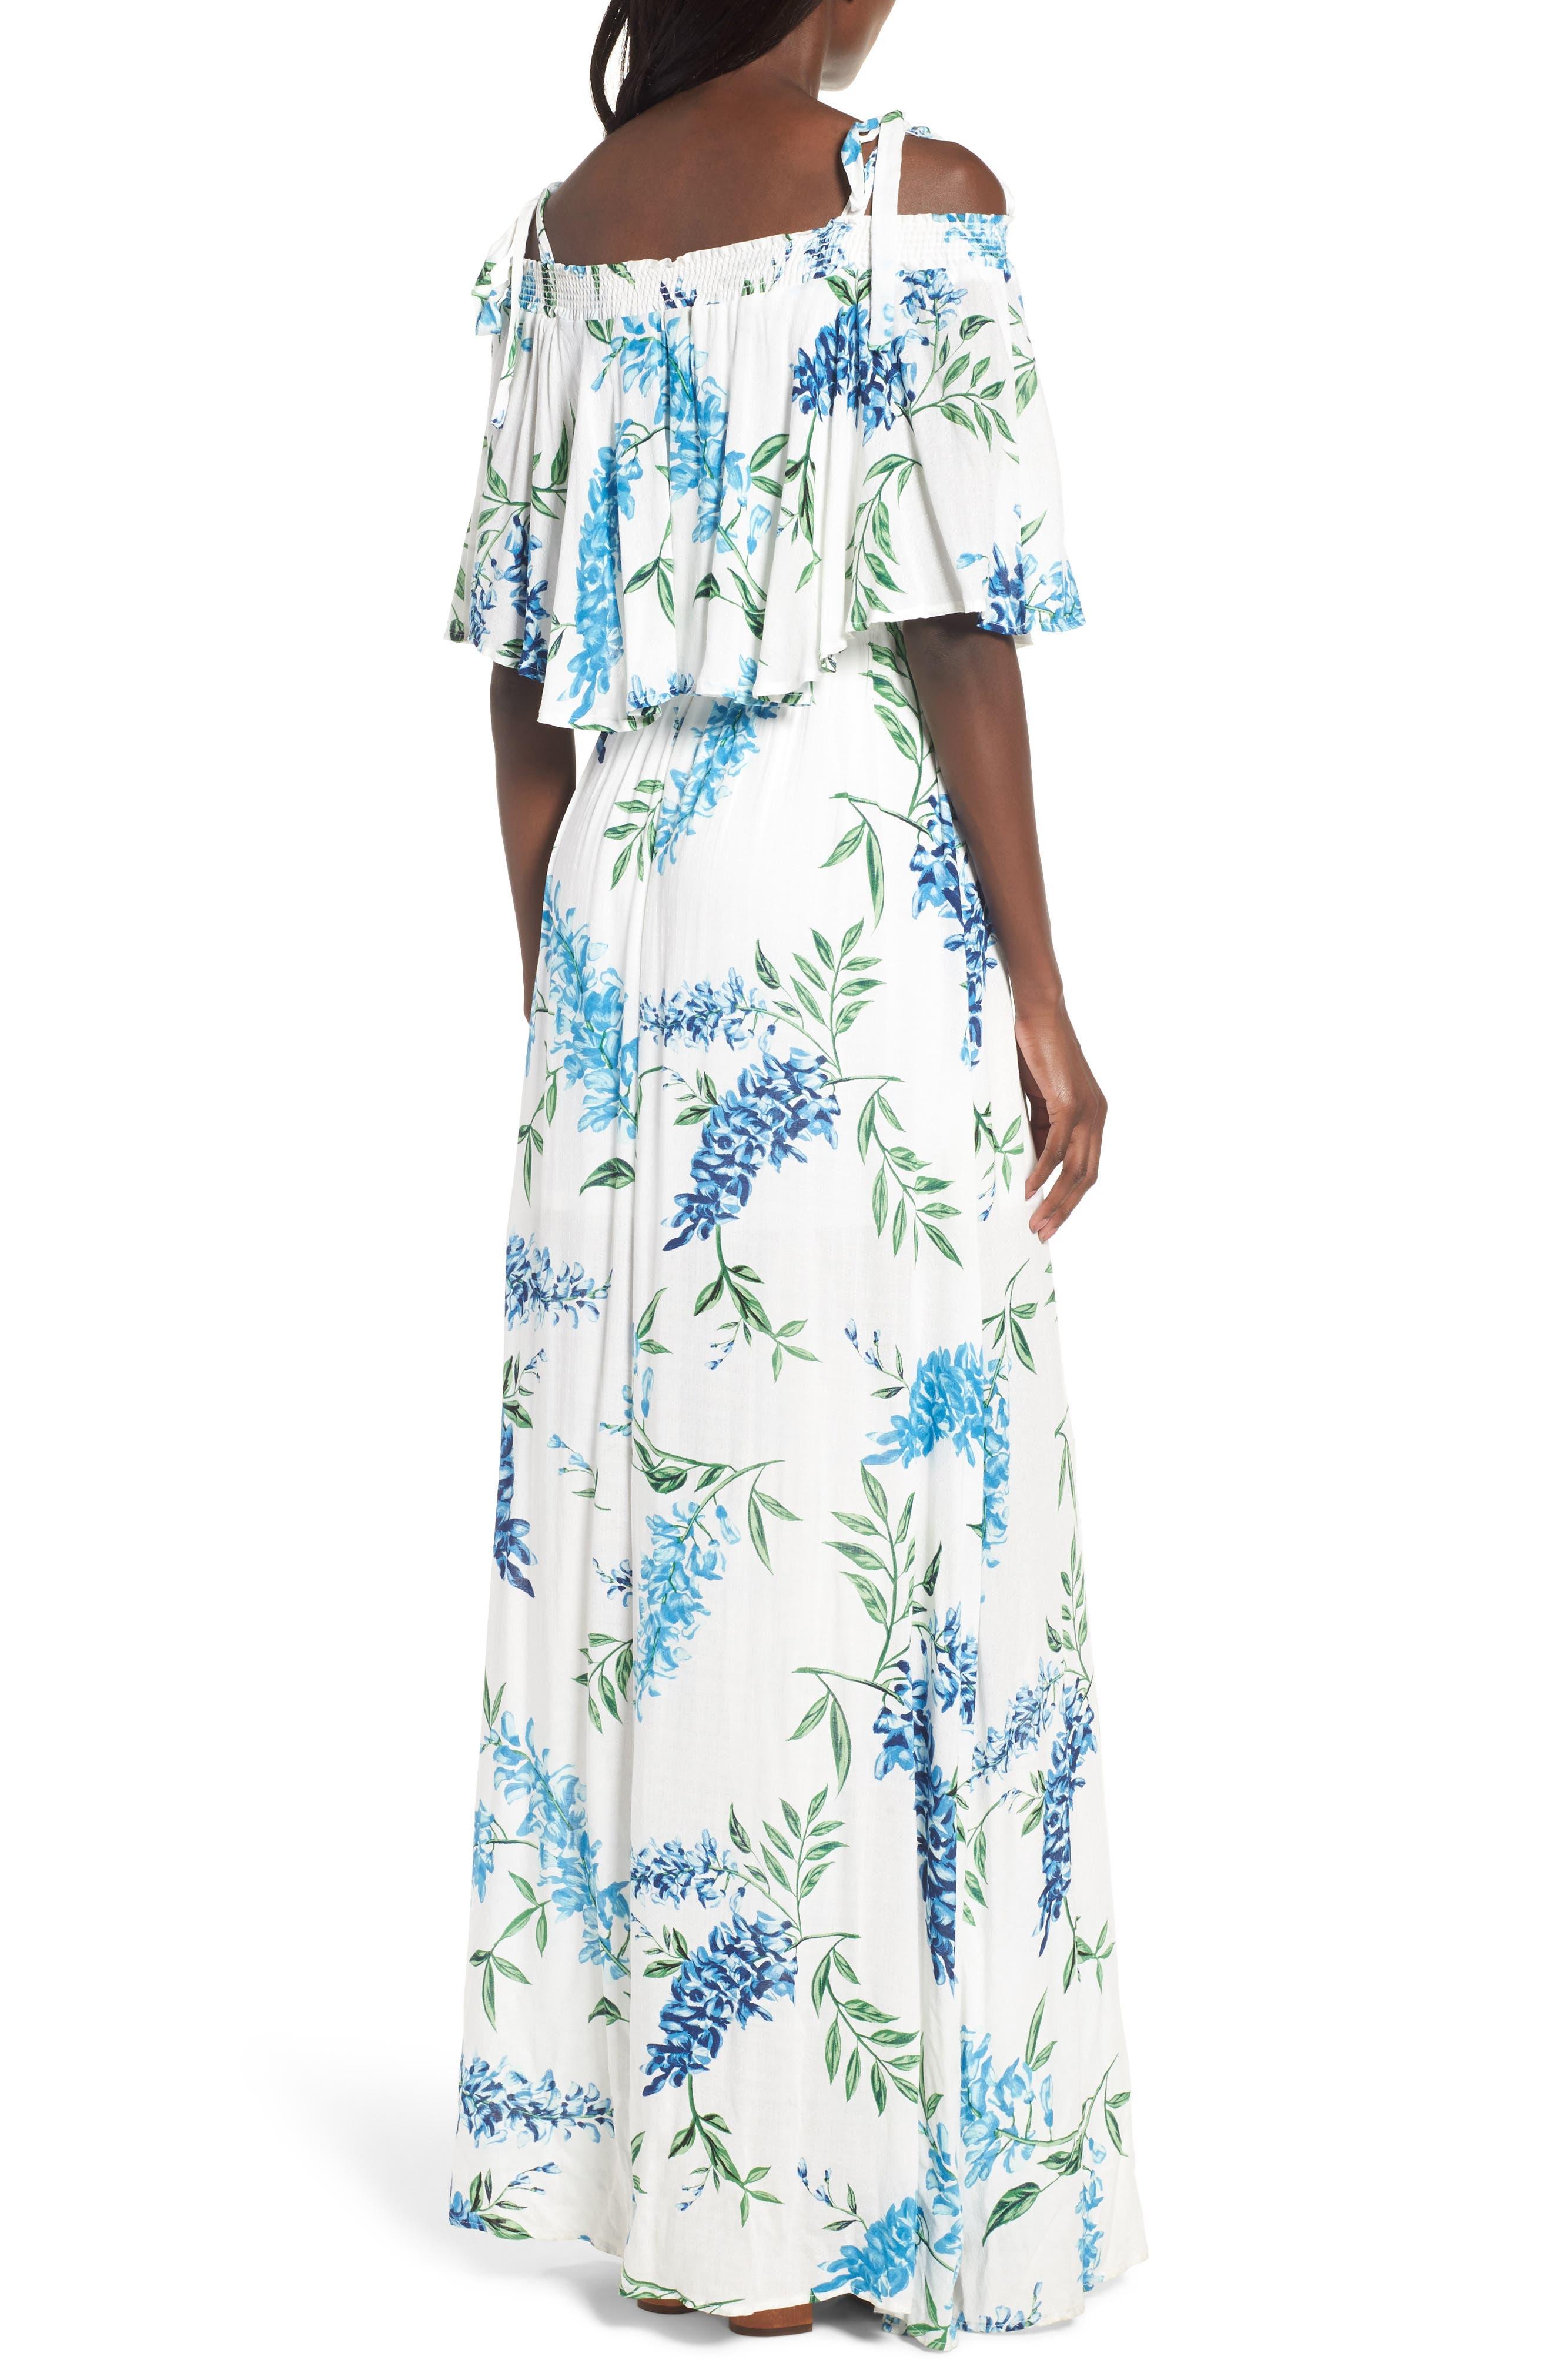 Nicola Ruffle Maxi Dress,                             Alternate thumbnail 2, color,                             400